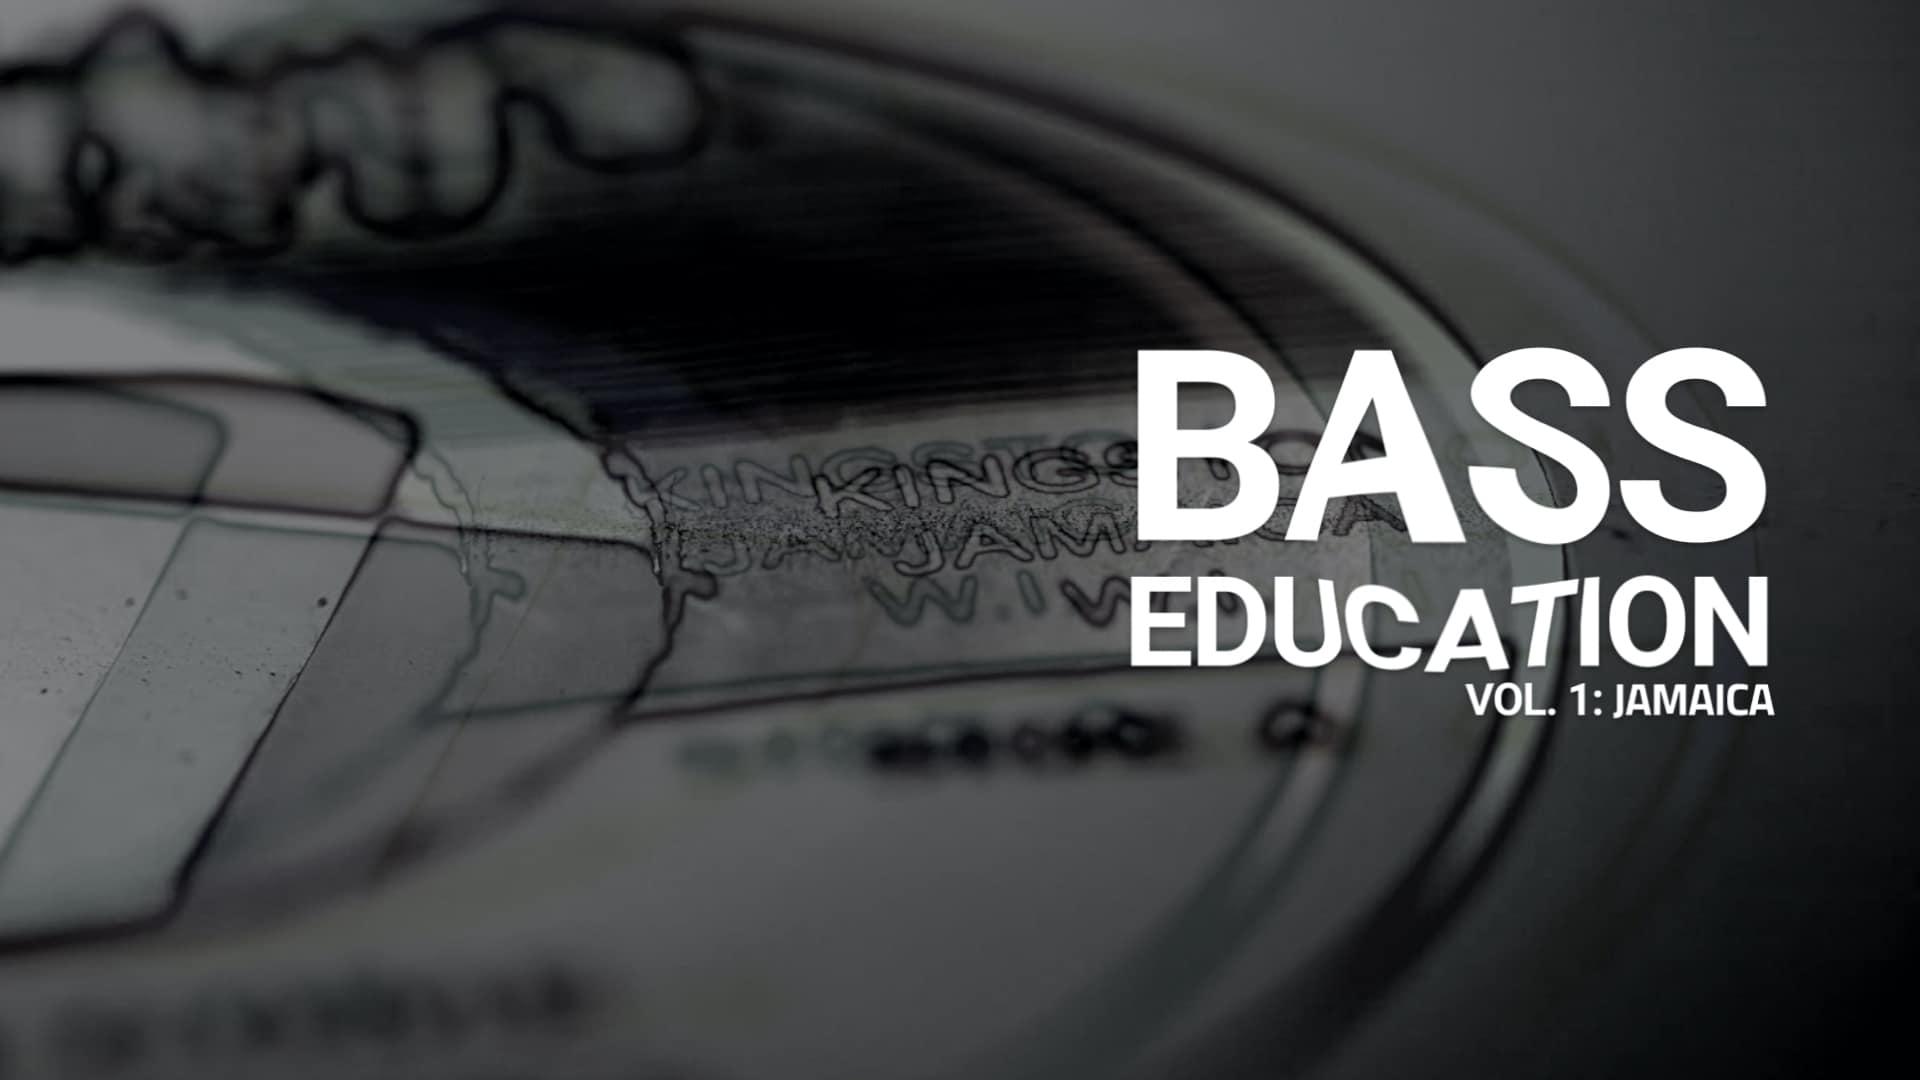 Bass Education